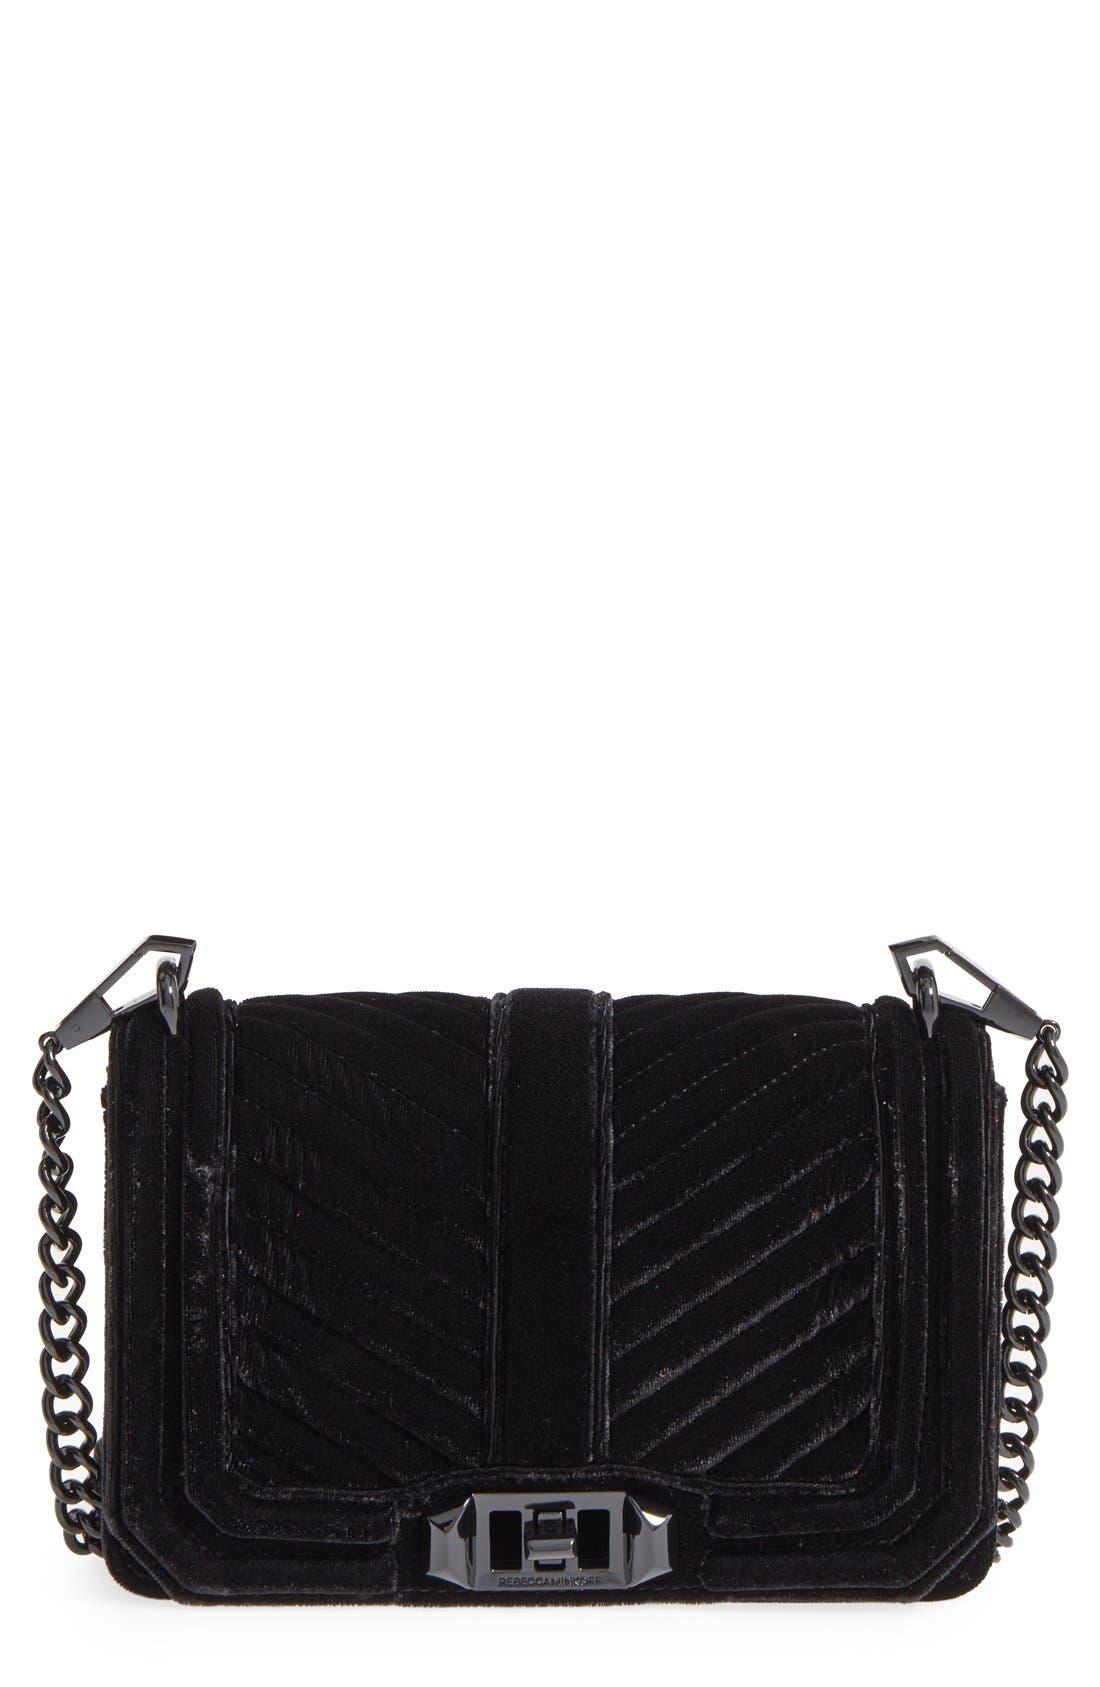 Main Image - Rebecca Minkoff Small Love Quilted Velvet Crossbody Bag